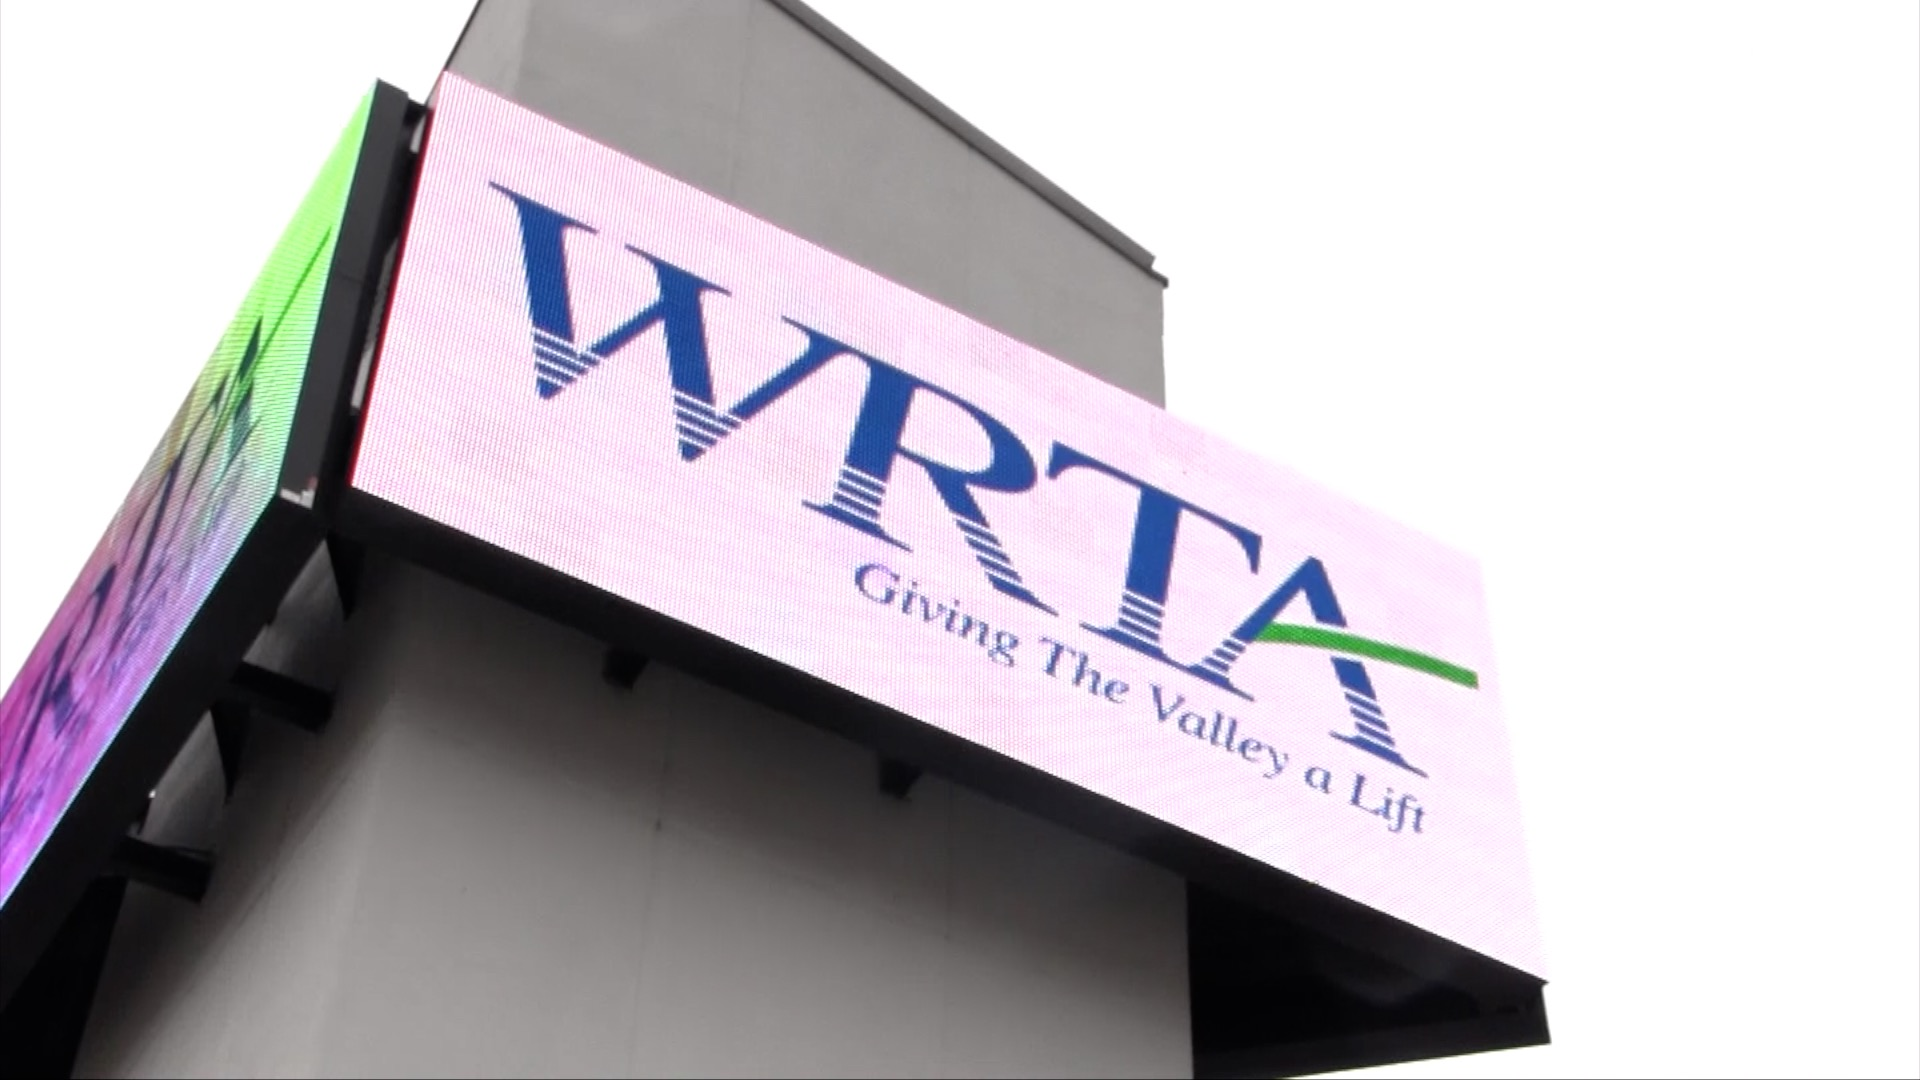 Western Reserve Transit Authority